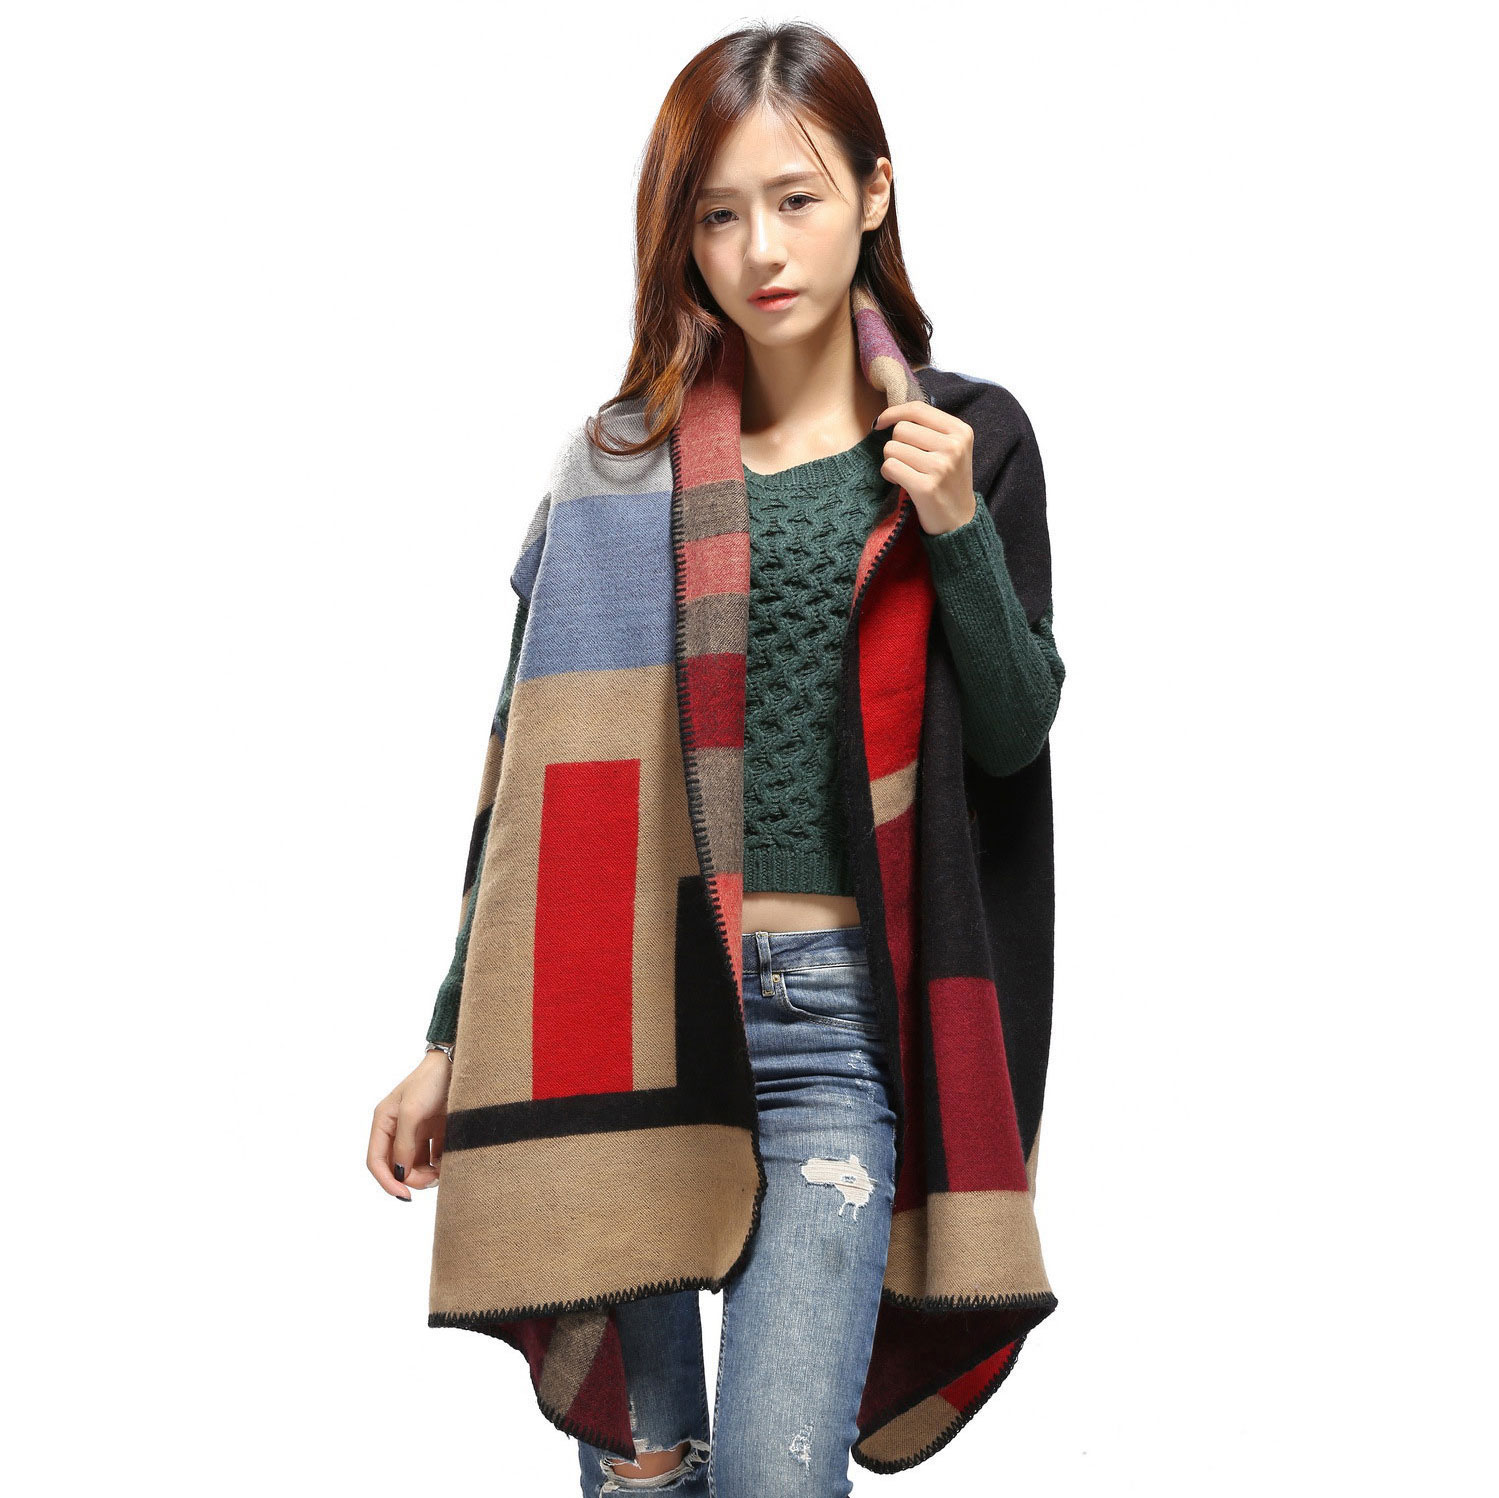 Street Snap 2017 Winter Runway Shawls Womens Plaid Woolen Cape Poncho Jacket Lady Warm Oversized Cardigan Cloak Coat